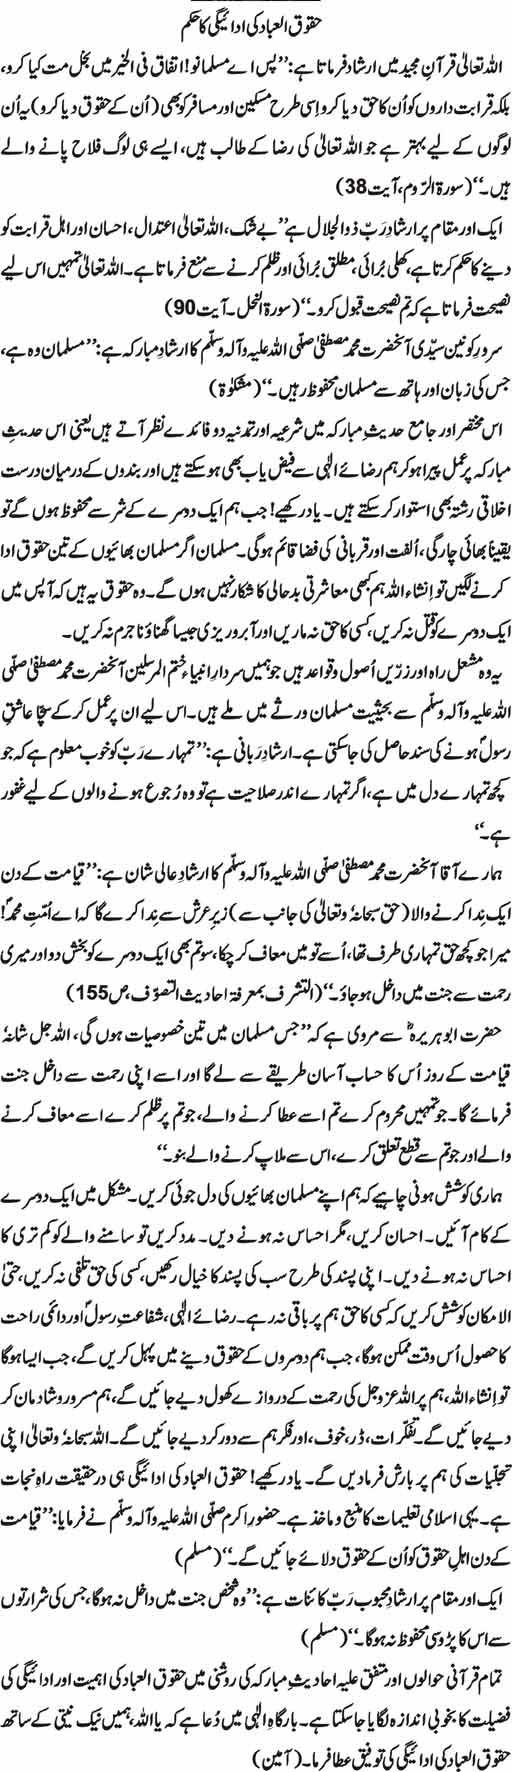 Islamic essays